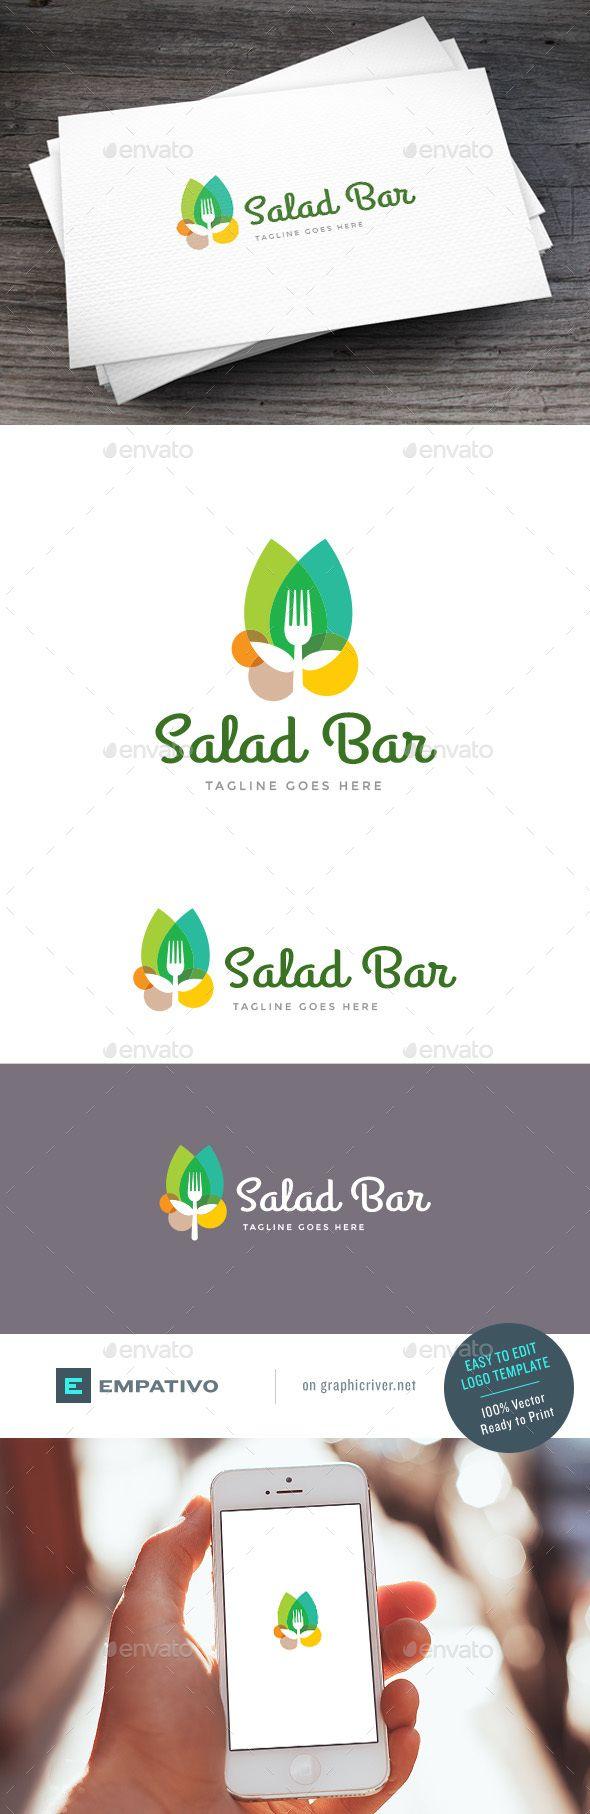 Salad Bar Logo   EPS Template • Download ↓ https://graphicriver.net/item/salad-bar-logo-template/15782770?ref=pxcr